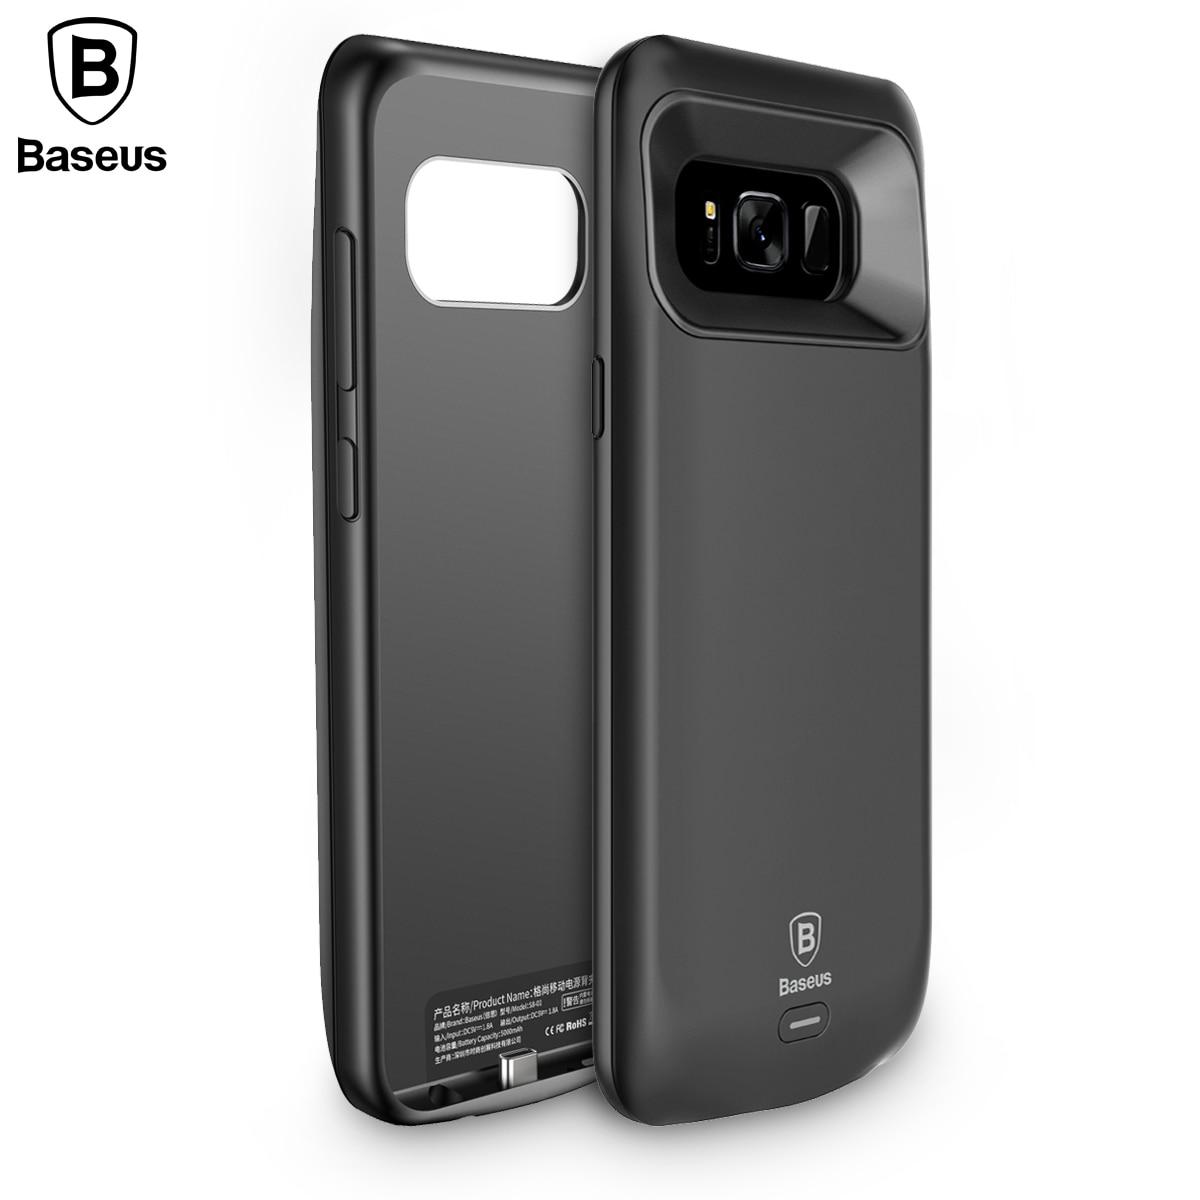 bilder für Baseus Ladegerät Fall Für Samsung Galaxy S8 Plus 5000 mAh/5500 mAh Externe Unterstützungsbatterie Energienbank Lade abdeckung Fall